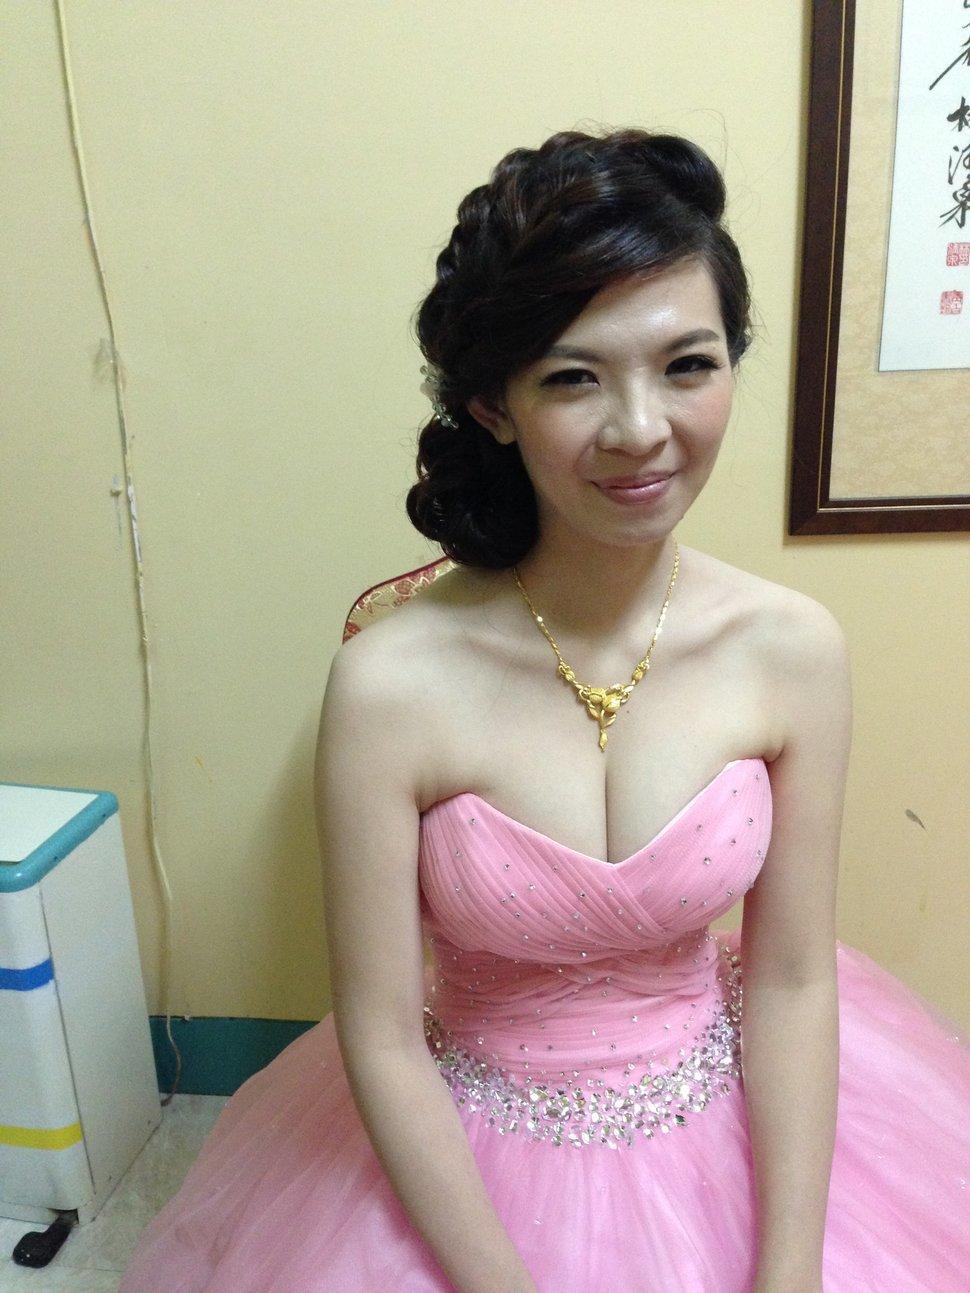 【SUN Studio新娘秘書】婚宴造型-麗雲(編號:428157) - SUN Studio-珊珊 新娘秘書 - 結婚吧一站式婚禮服務平台